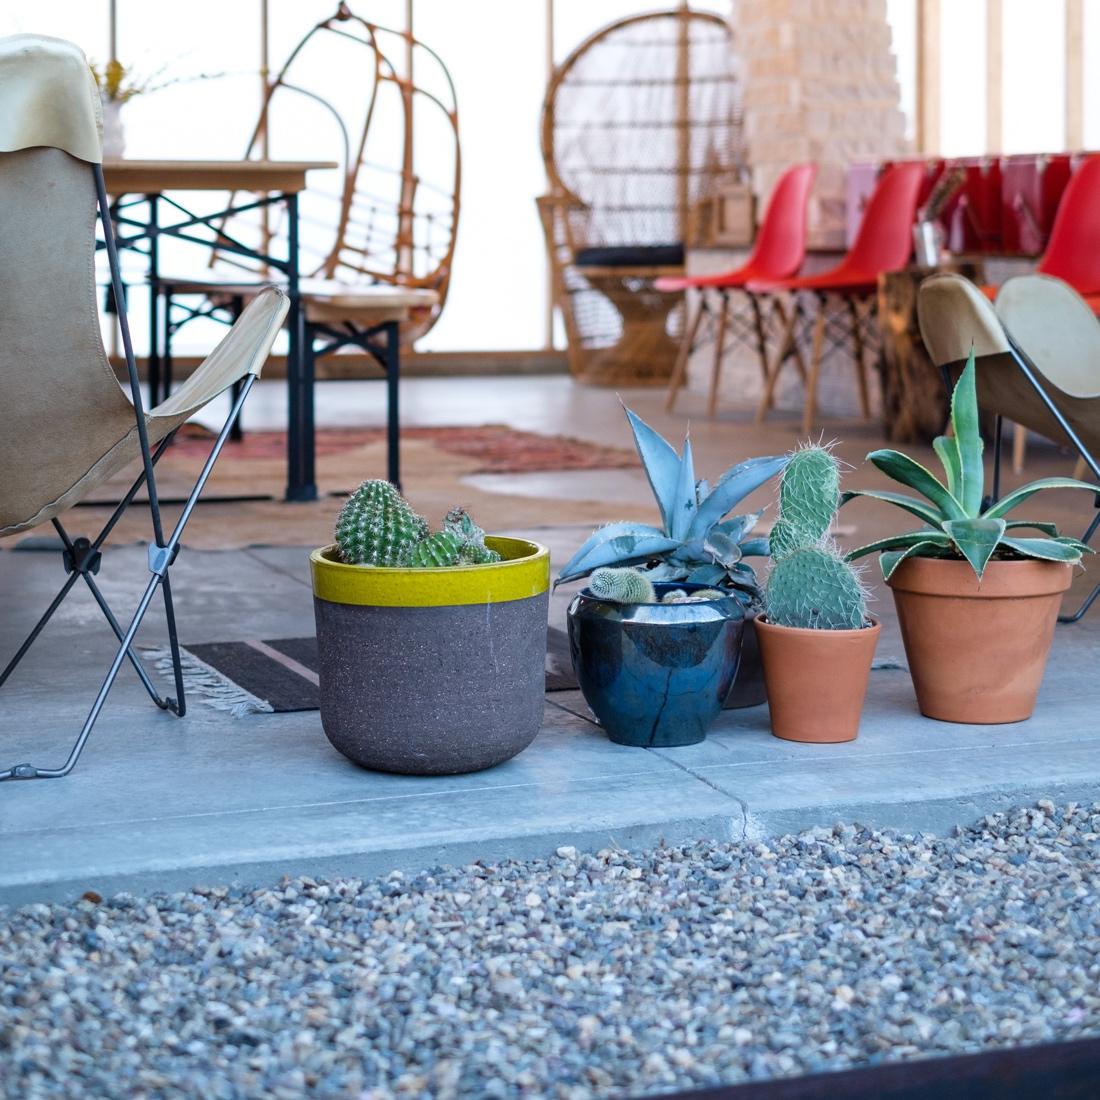 AMIGO MOTOR LODGE - A modern take on the motel located in Salida, CO